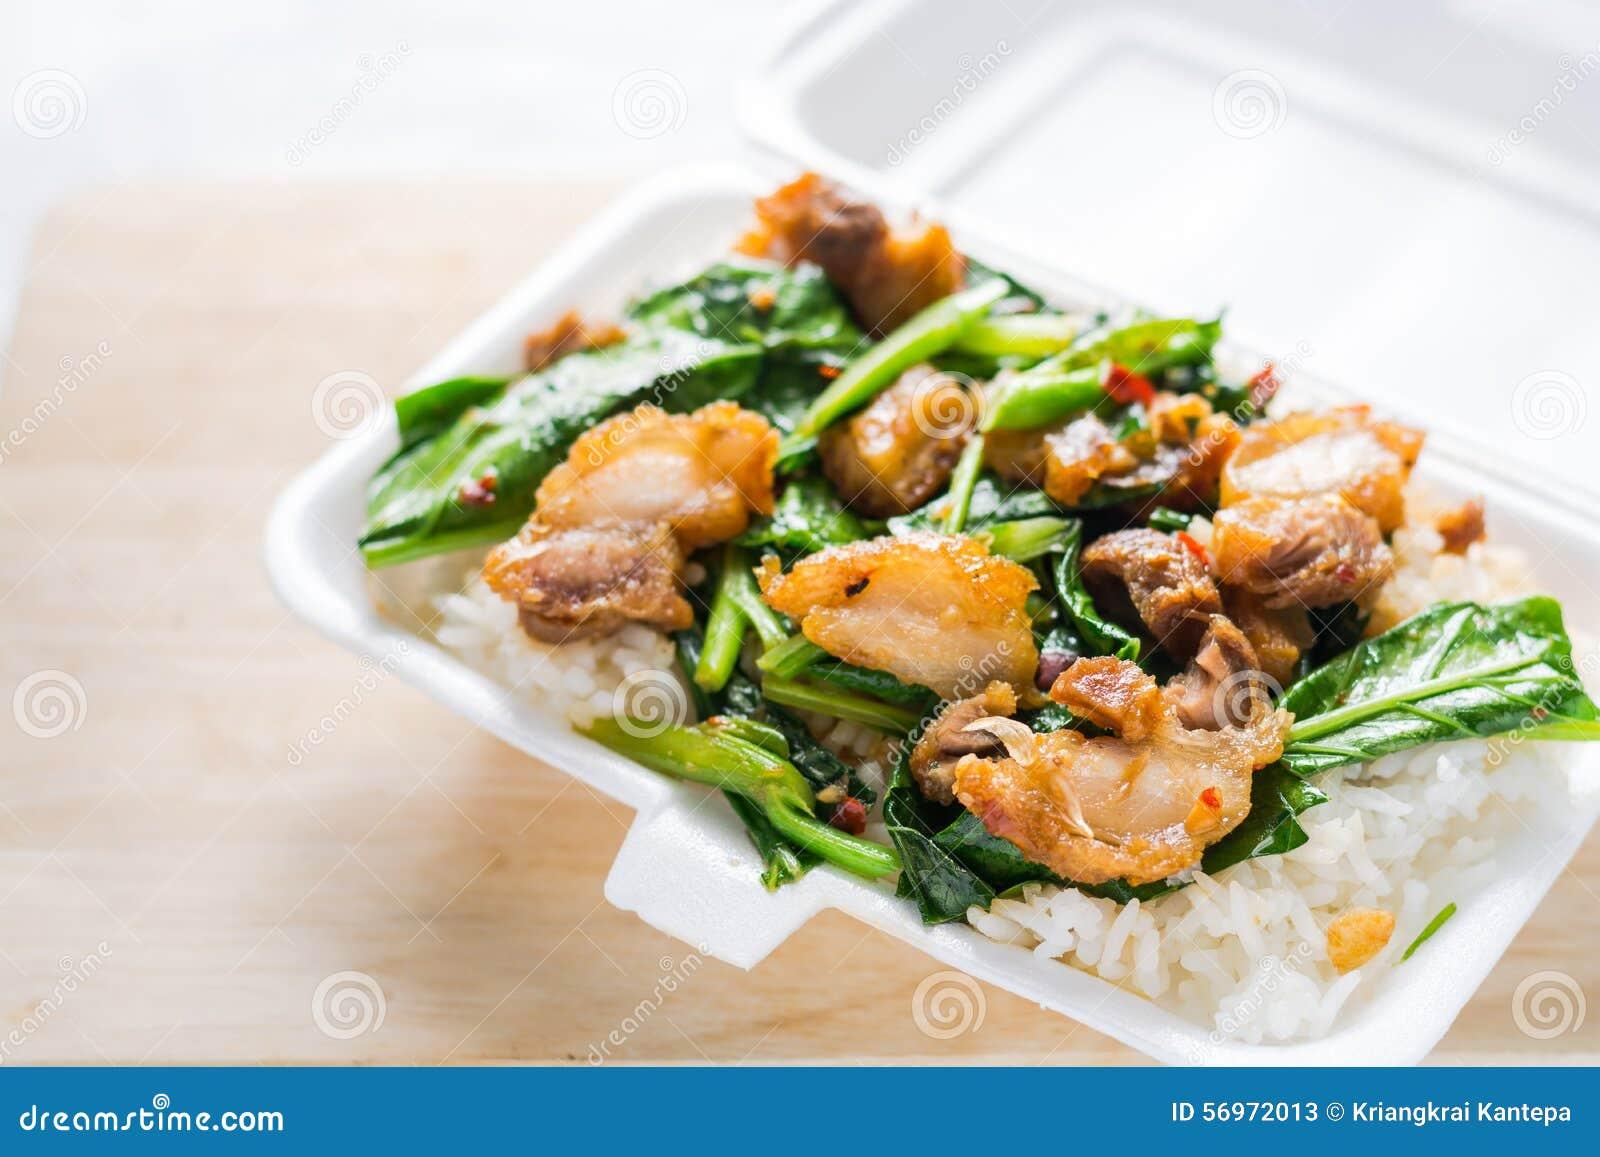 Crispy Pork Stir-fried Kale With Steamed Rice In Styrofoam ...